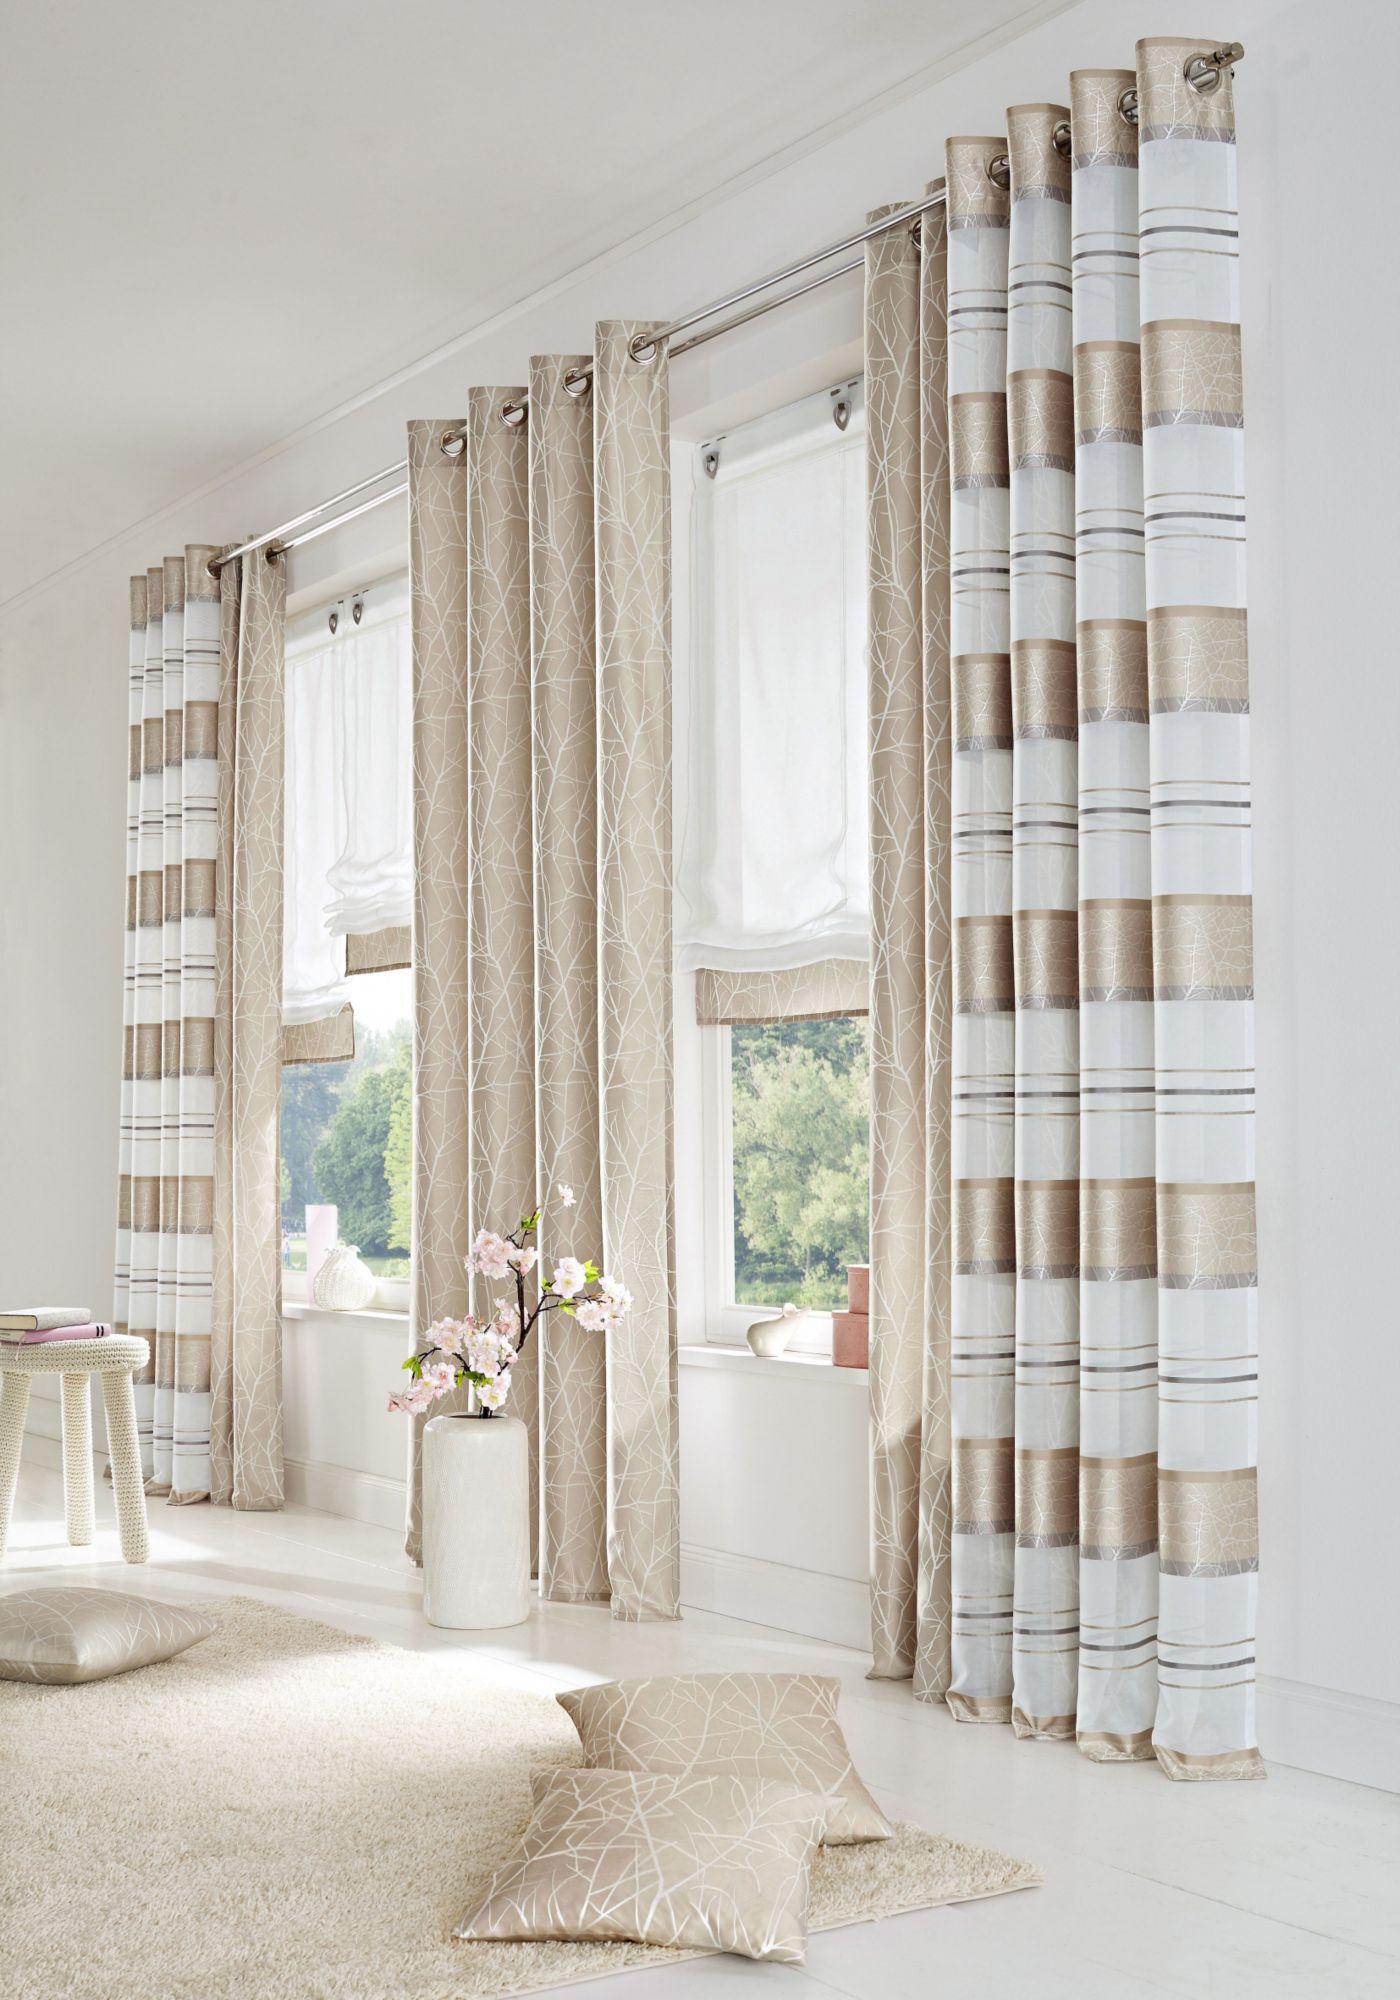 vorhang home wohnideen campos 2 st ck schwab versand sets. Black Bedroom Furniture Sets. Home Design Ideas